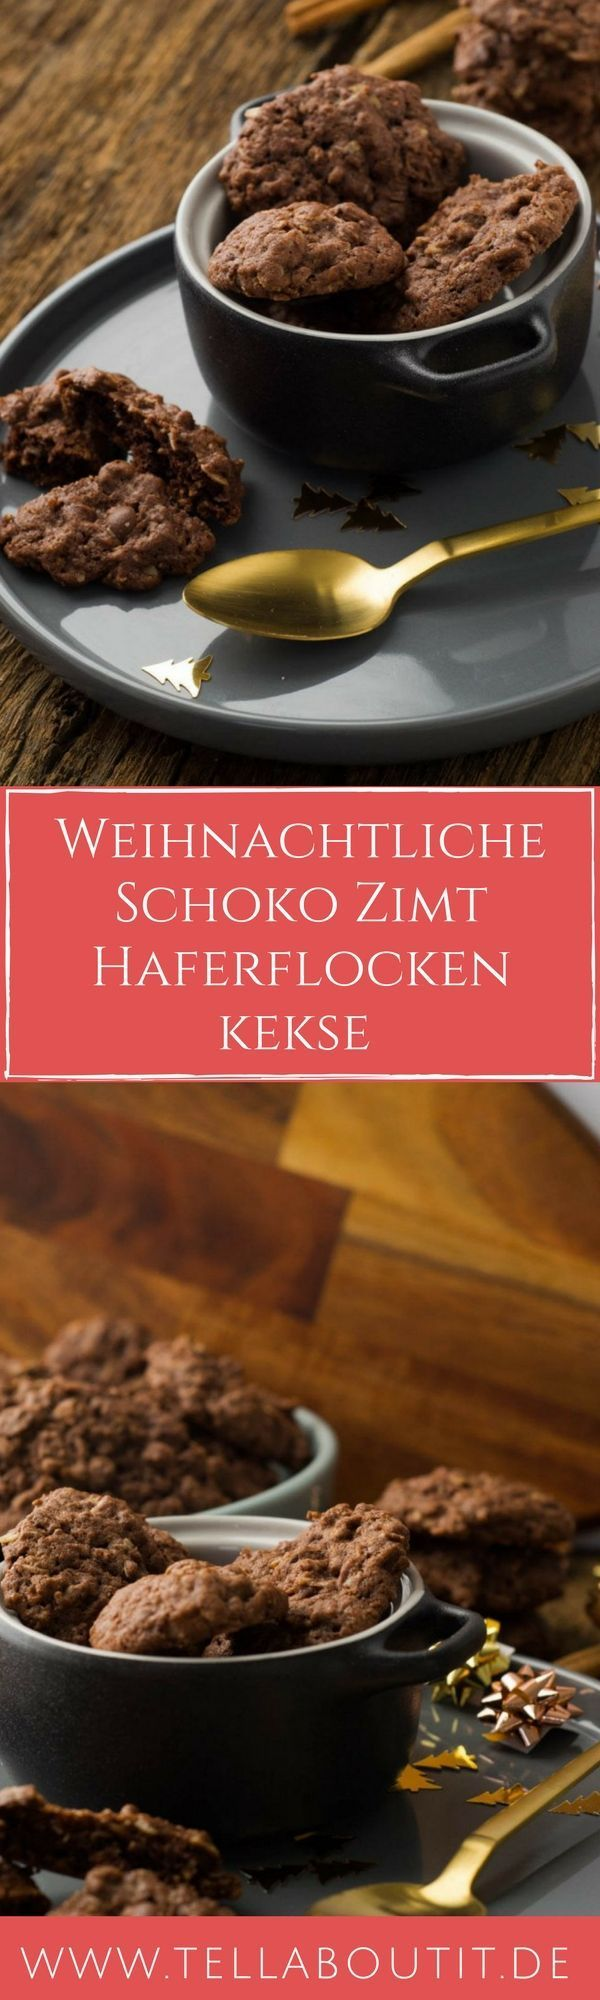 Schoko Haferflockenkekse mit Zimt – Taynara.de – Nachhaltig Leben